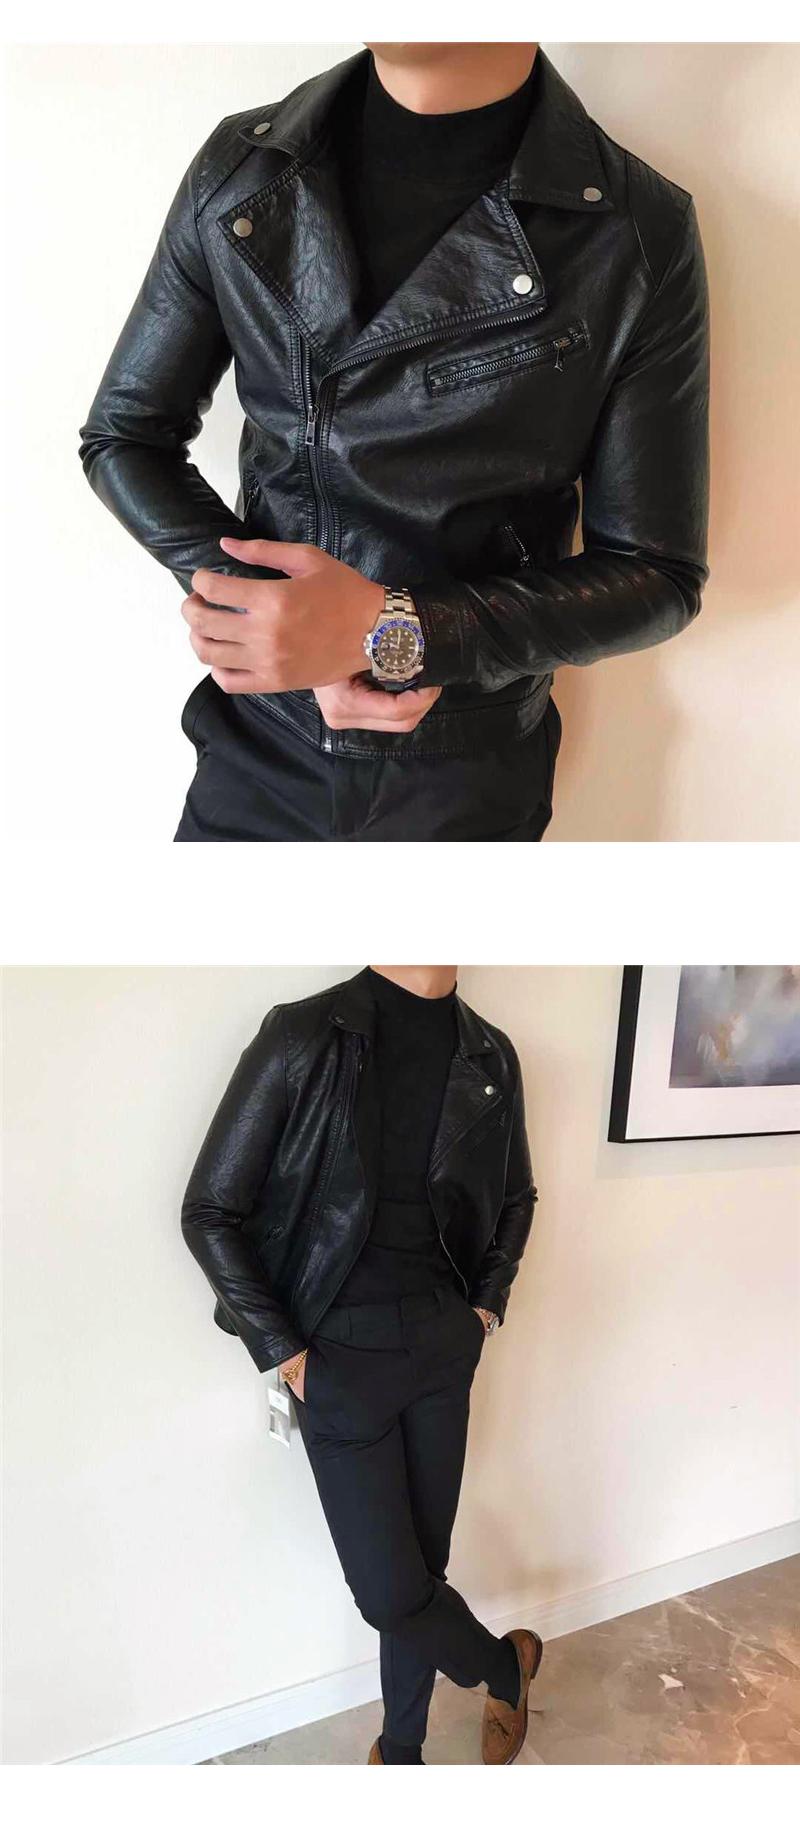 South Korea Korean version handsome collar leather jacket men's retro personality PU leather clothing fashion 100 locomotive leather fashion tide 61 Online shopping Bangladesh